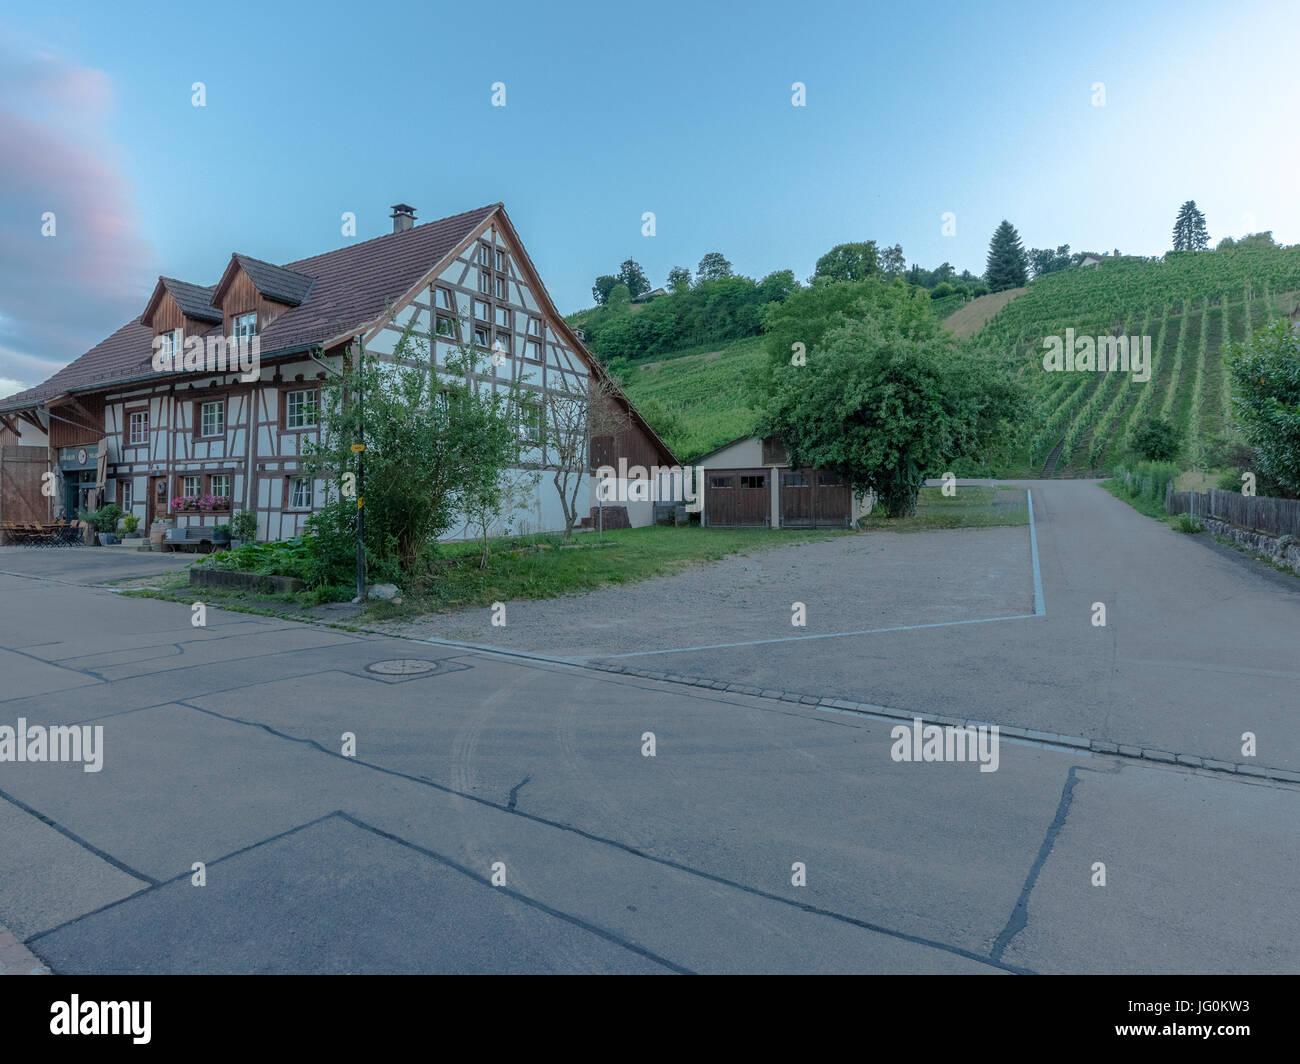 Village photos of Rüdlingen Stock Photo